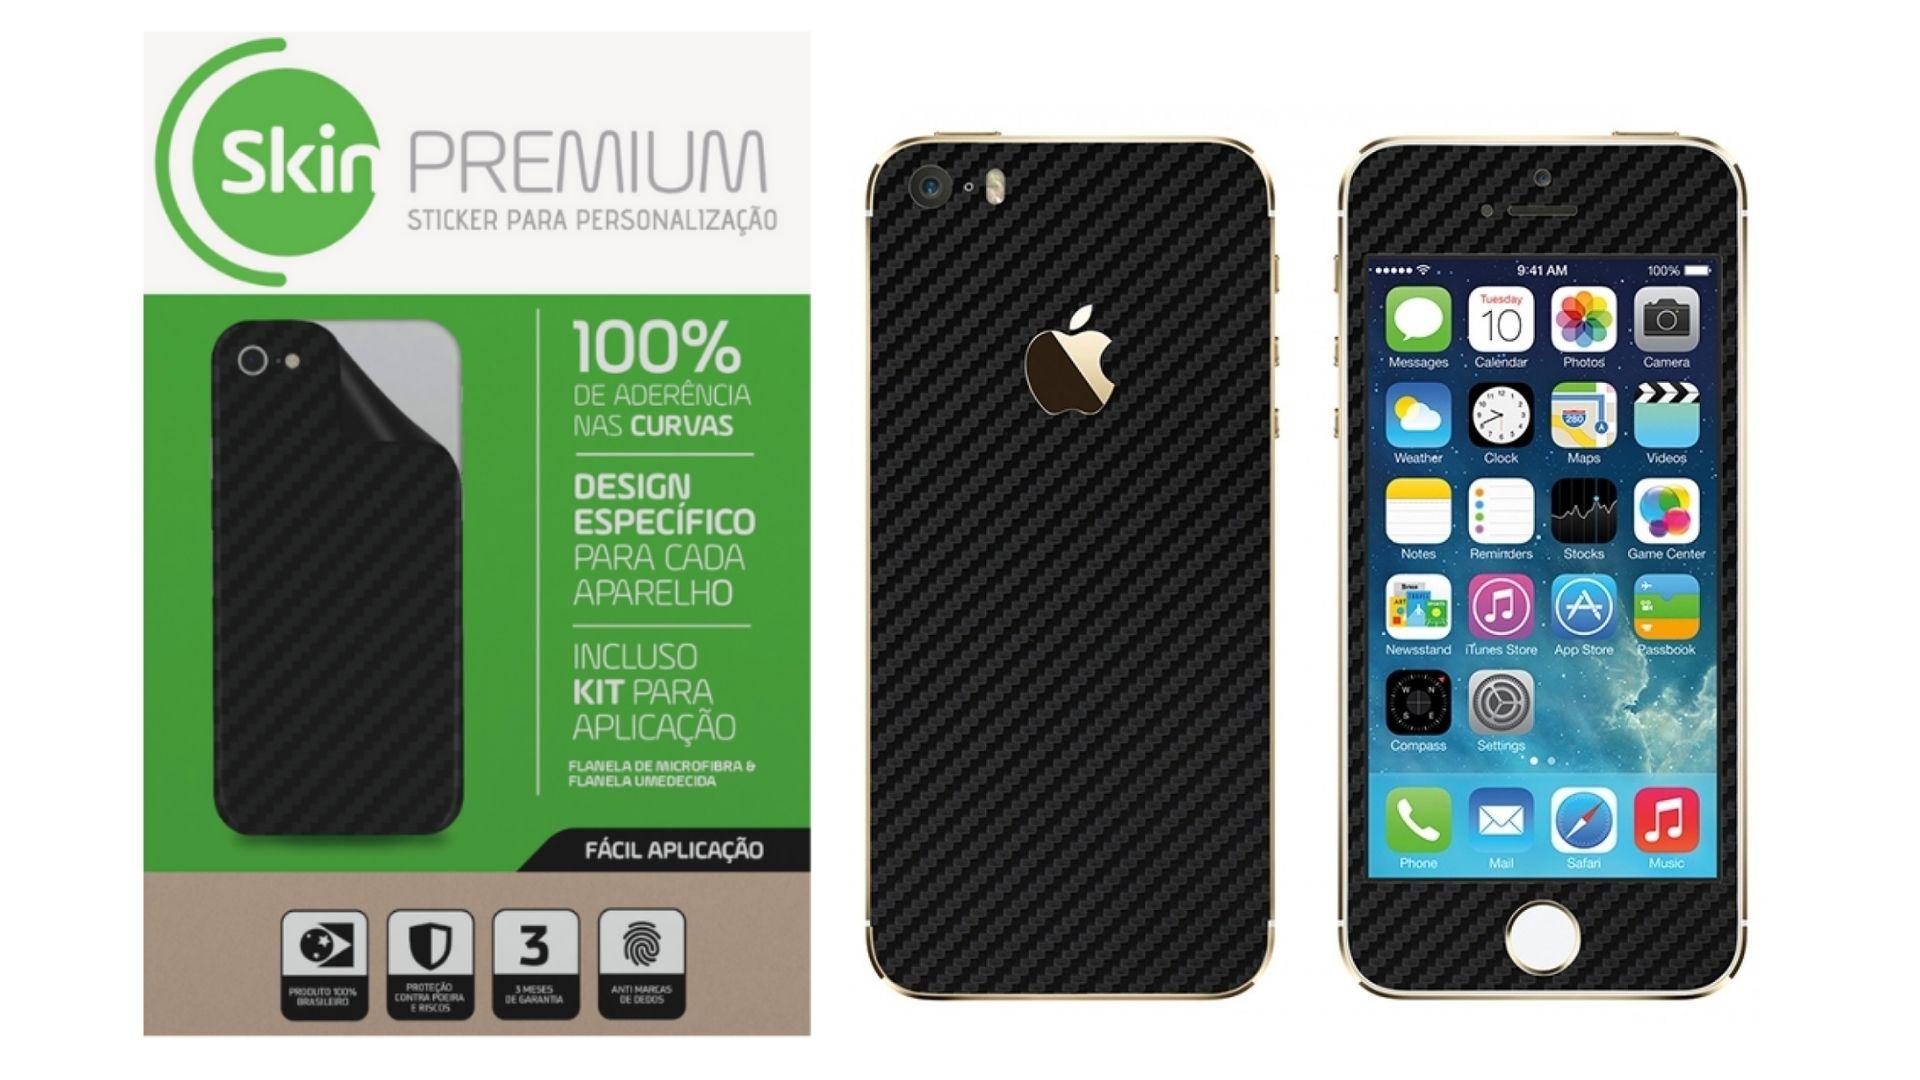 Skin Premium Fibra De Carbono Verso e Laterais para Iphone 5/5s/Se